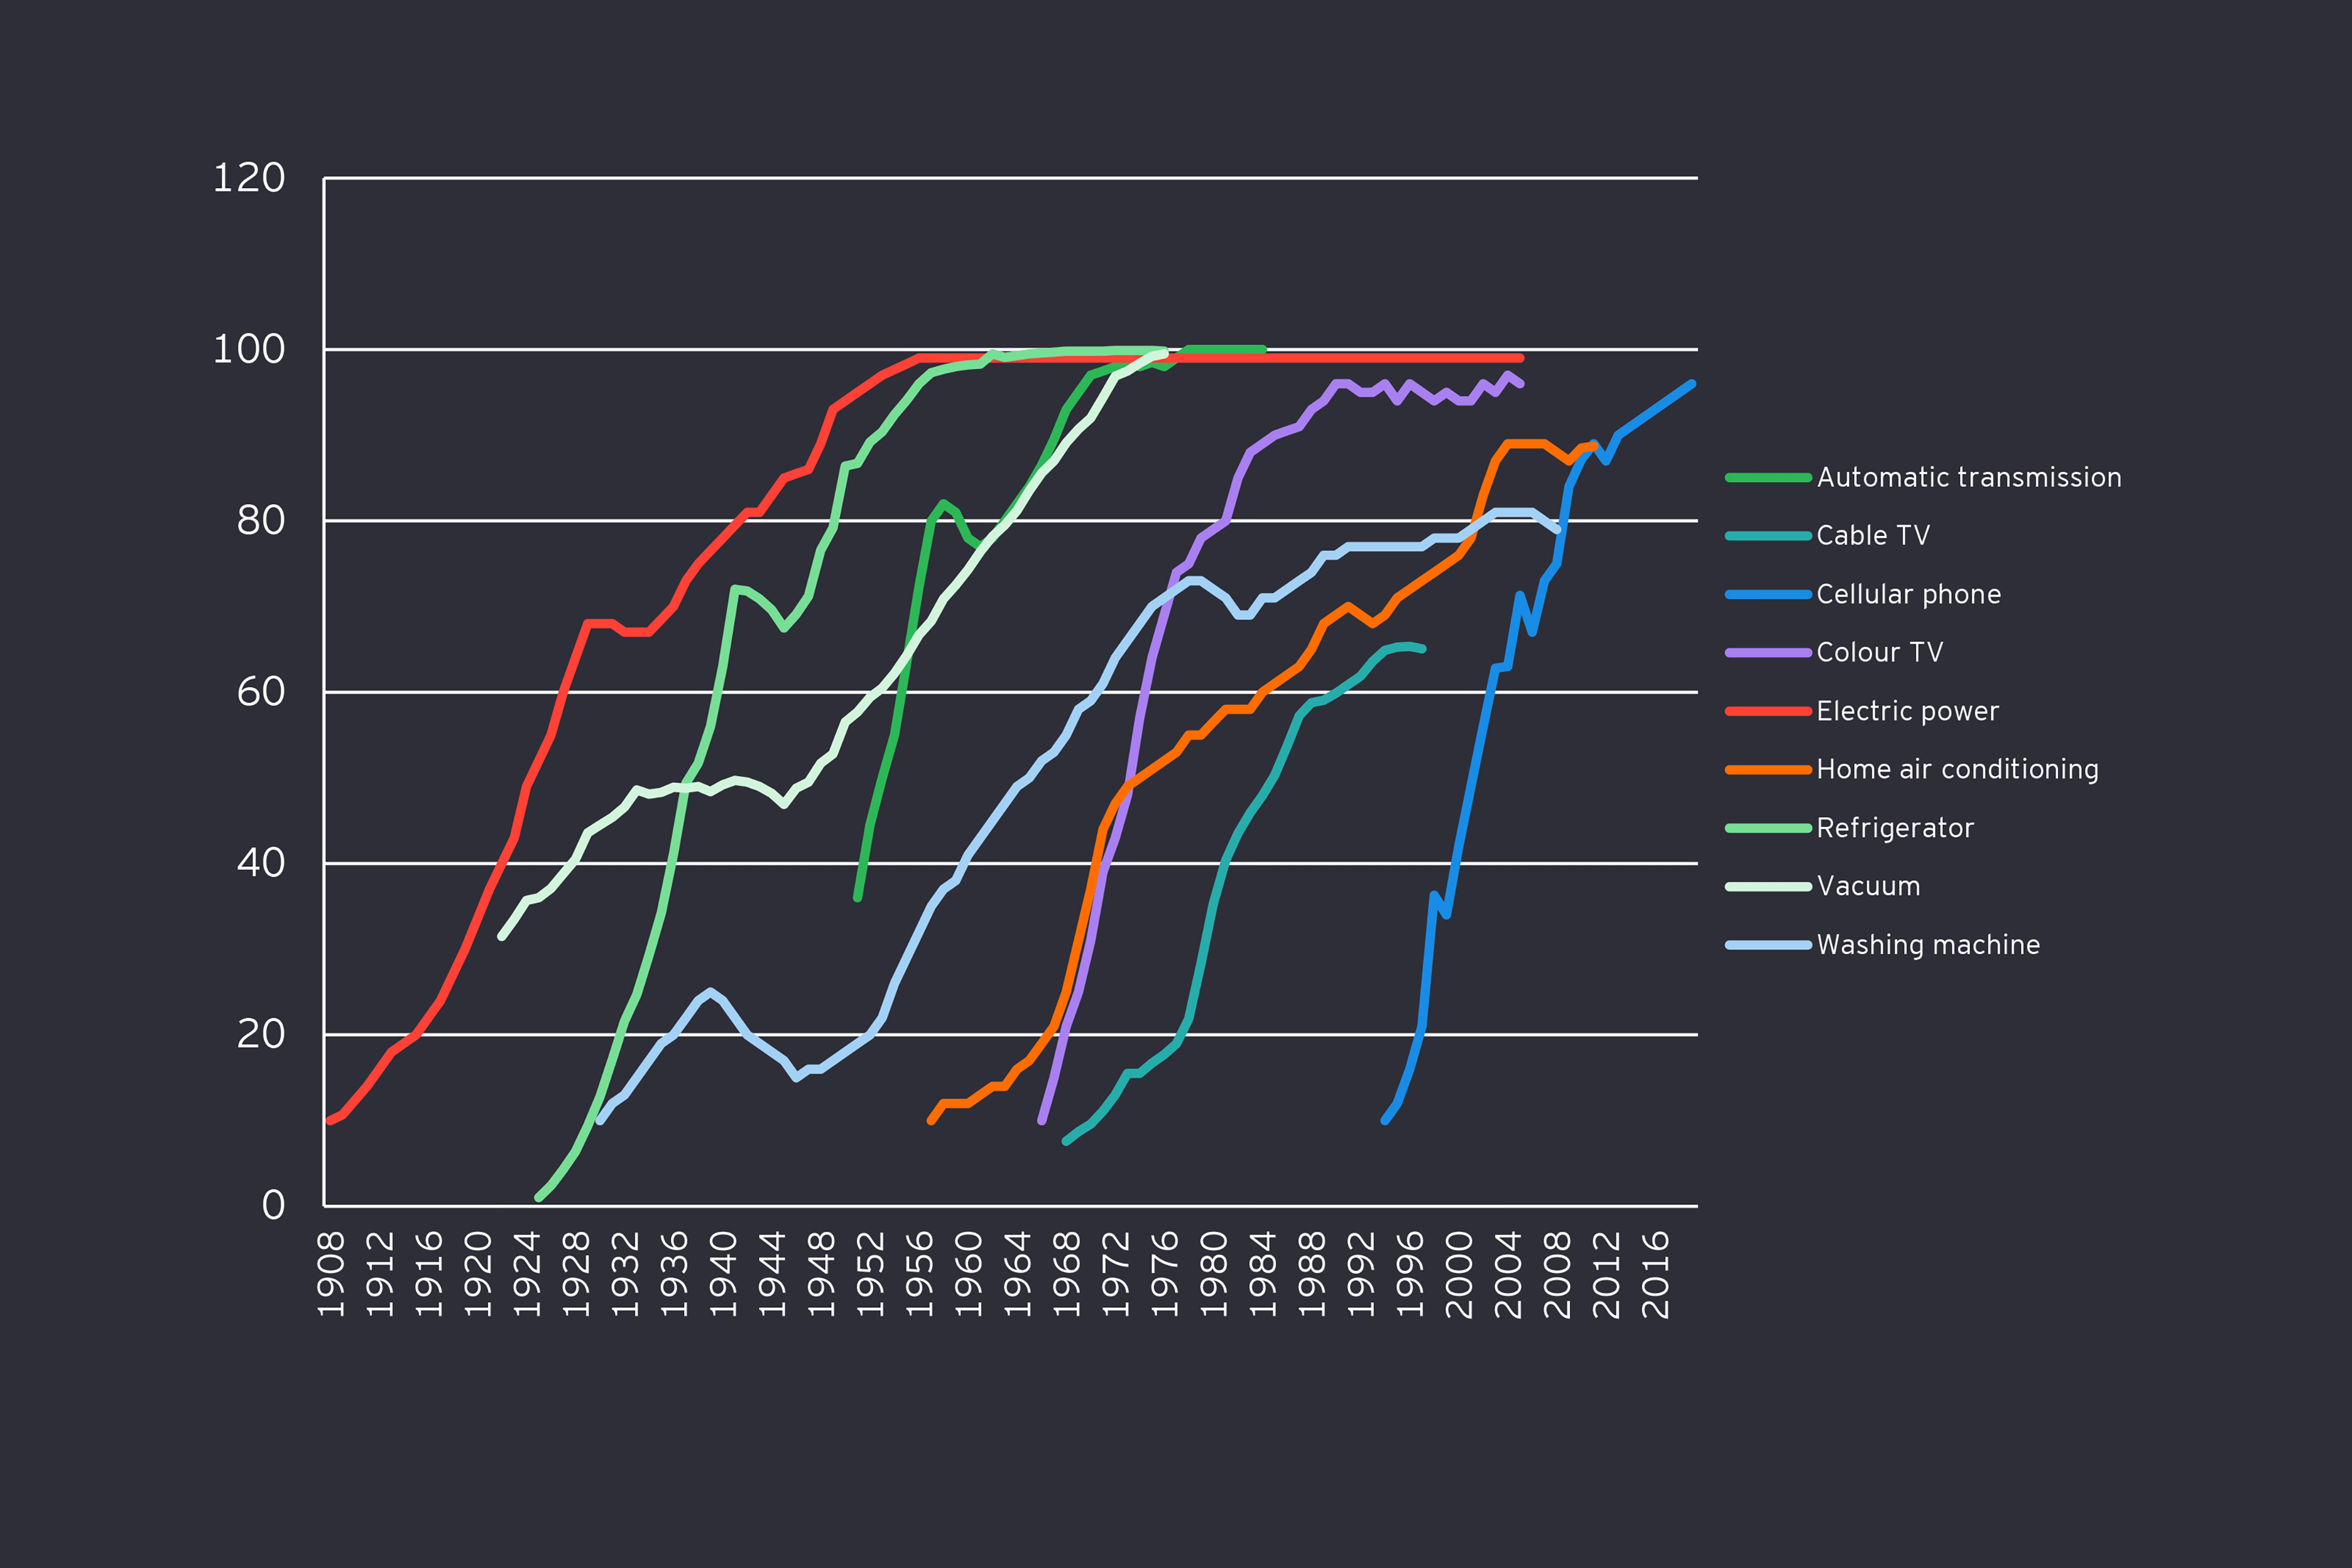 Technology adoption graphic